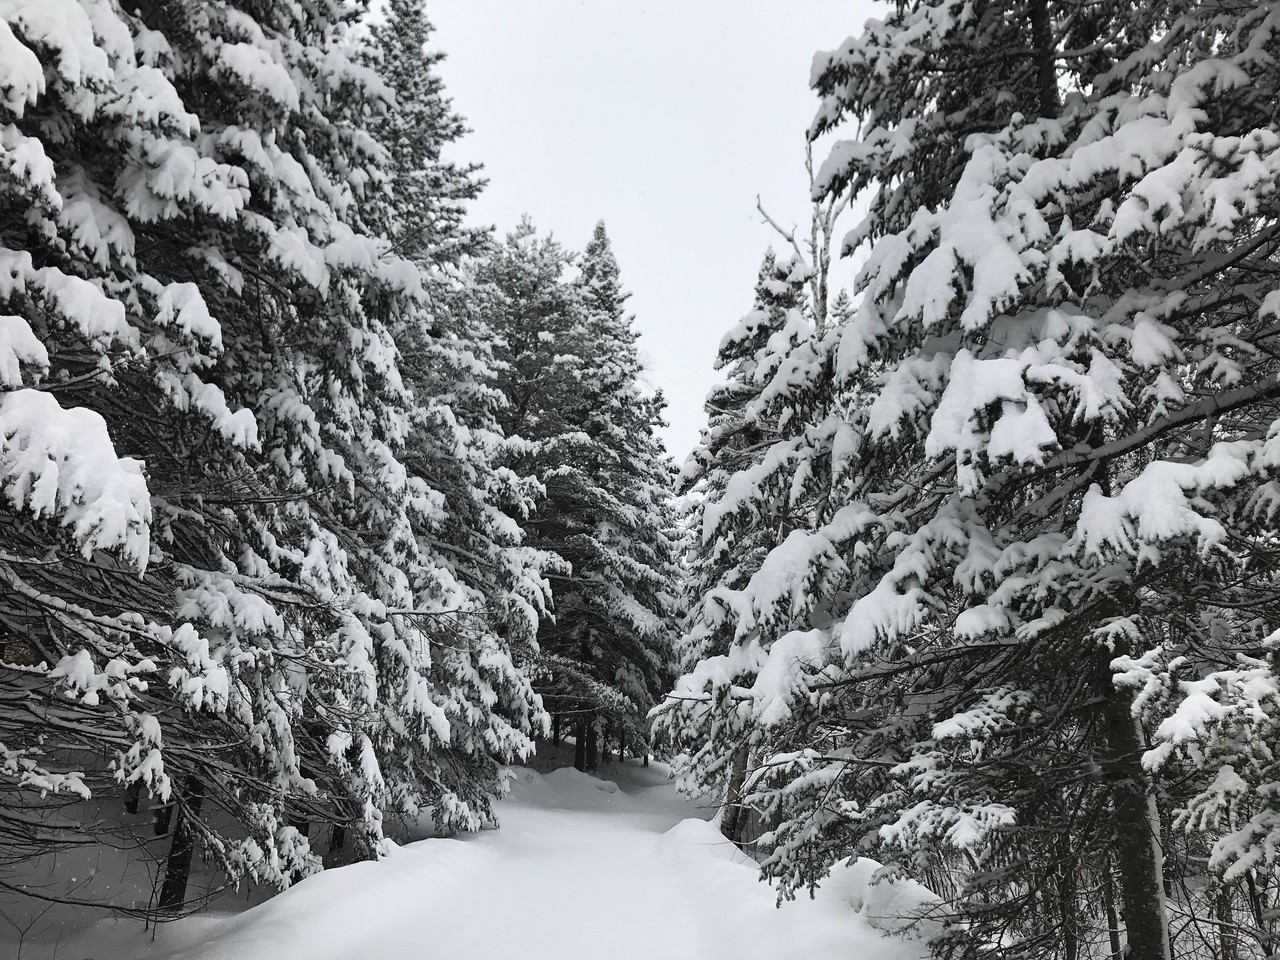 I love snow days